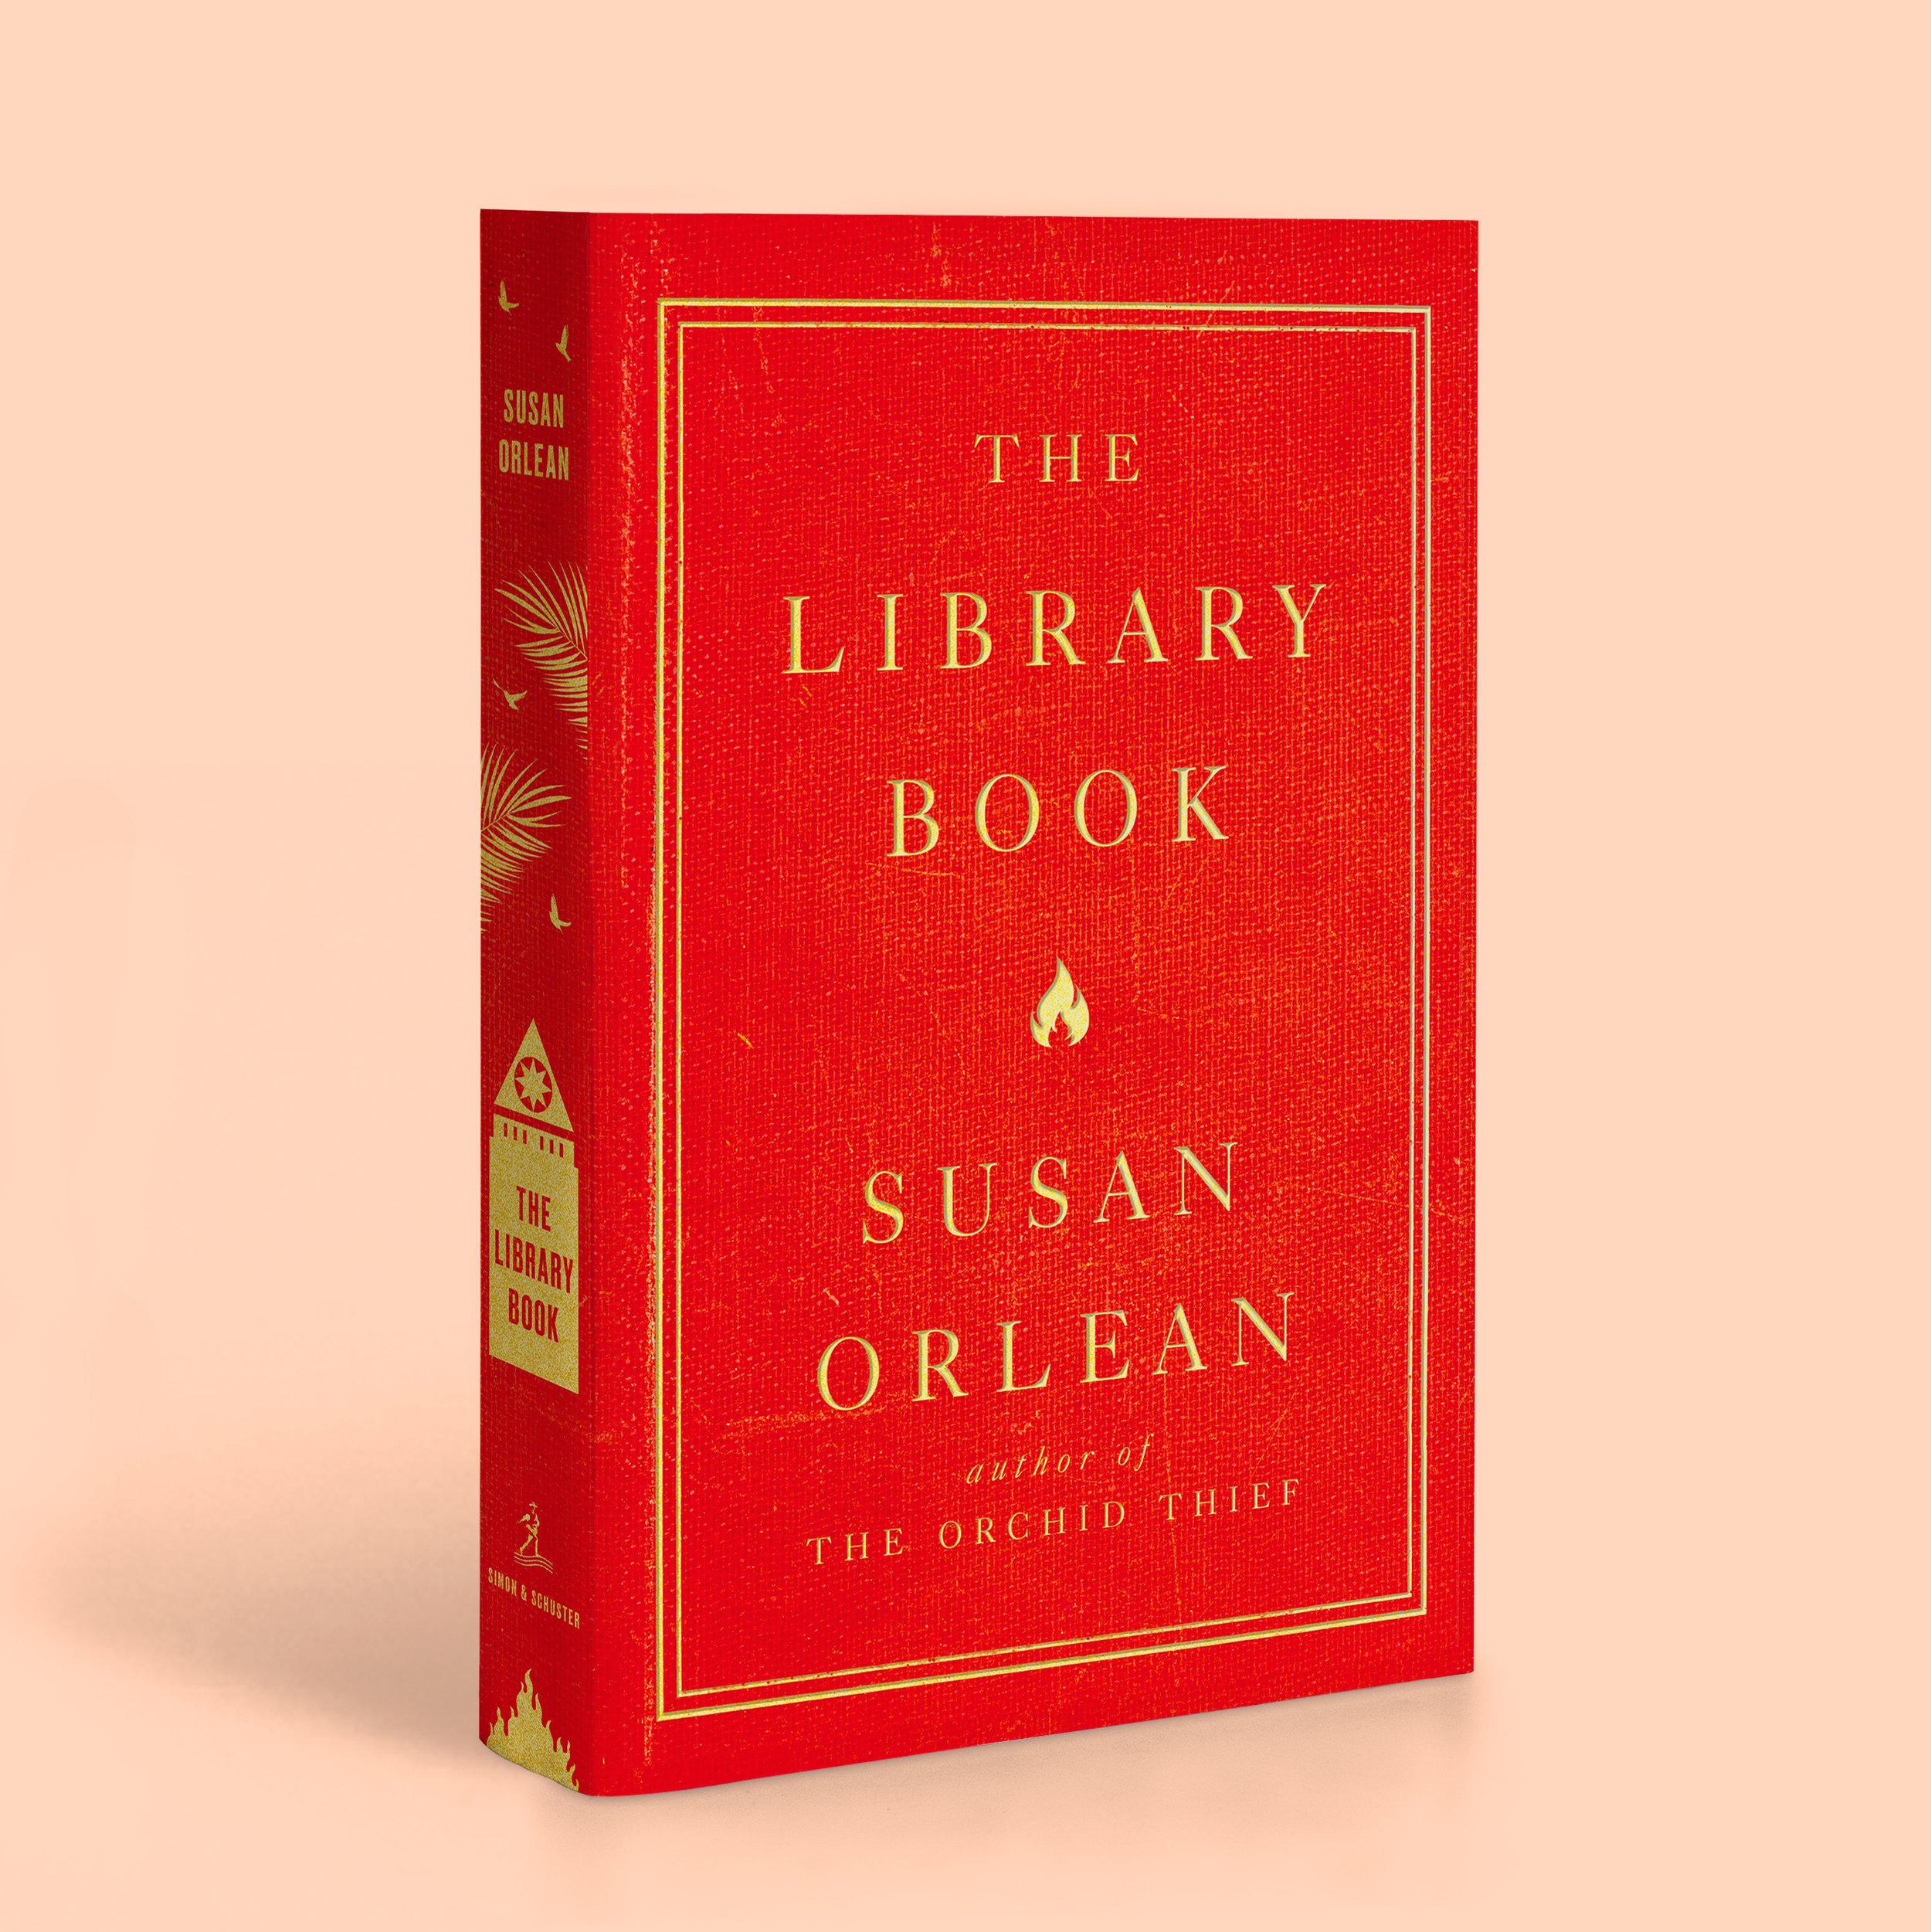 Lauren Peters-Collaer—The Library Book